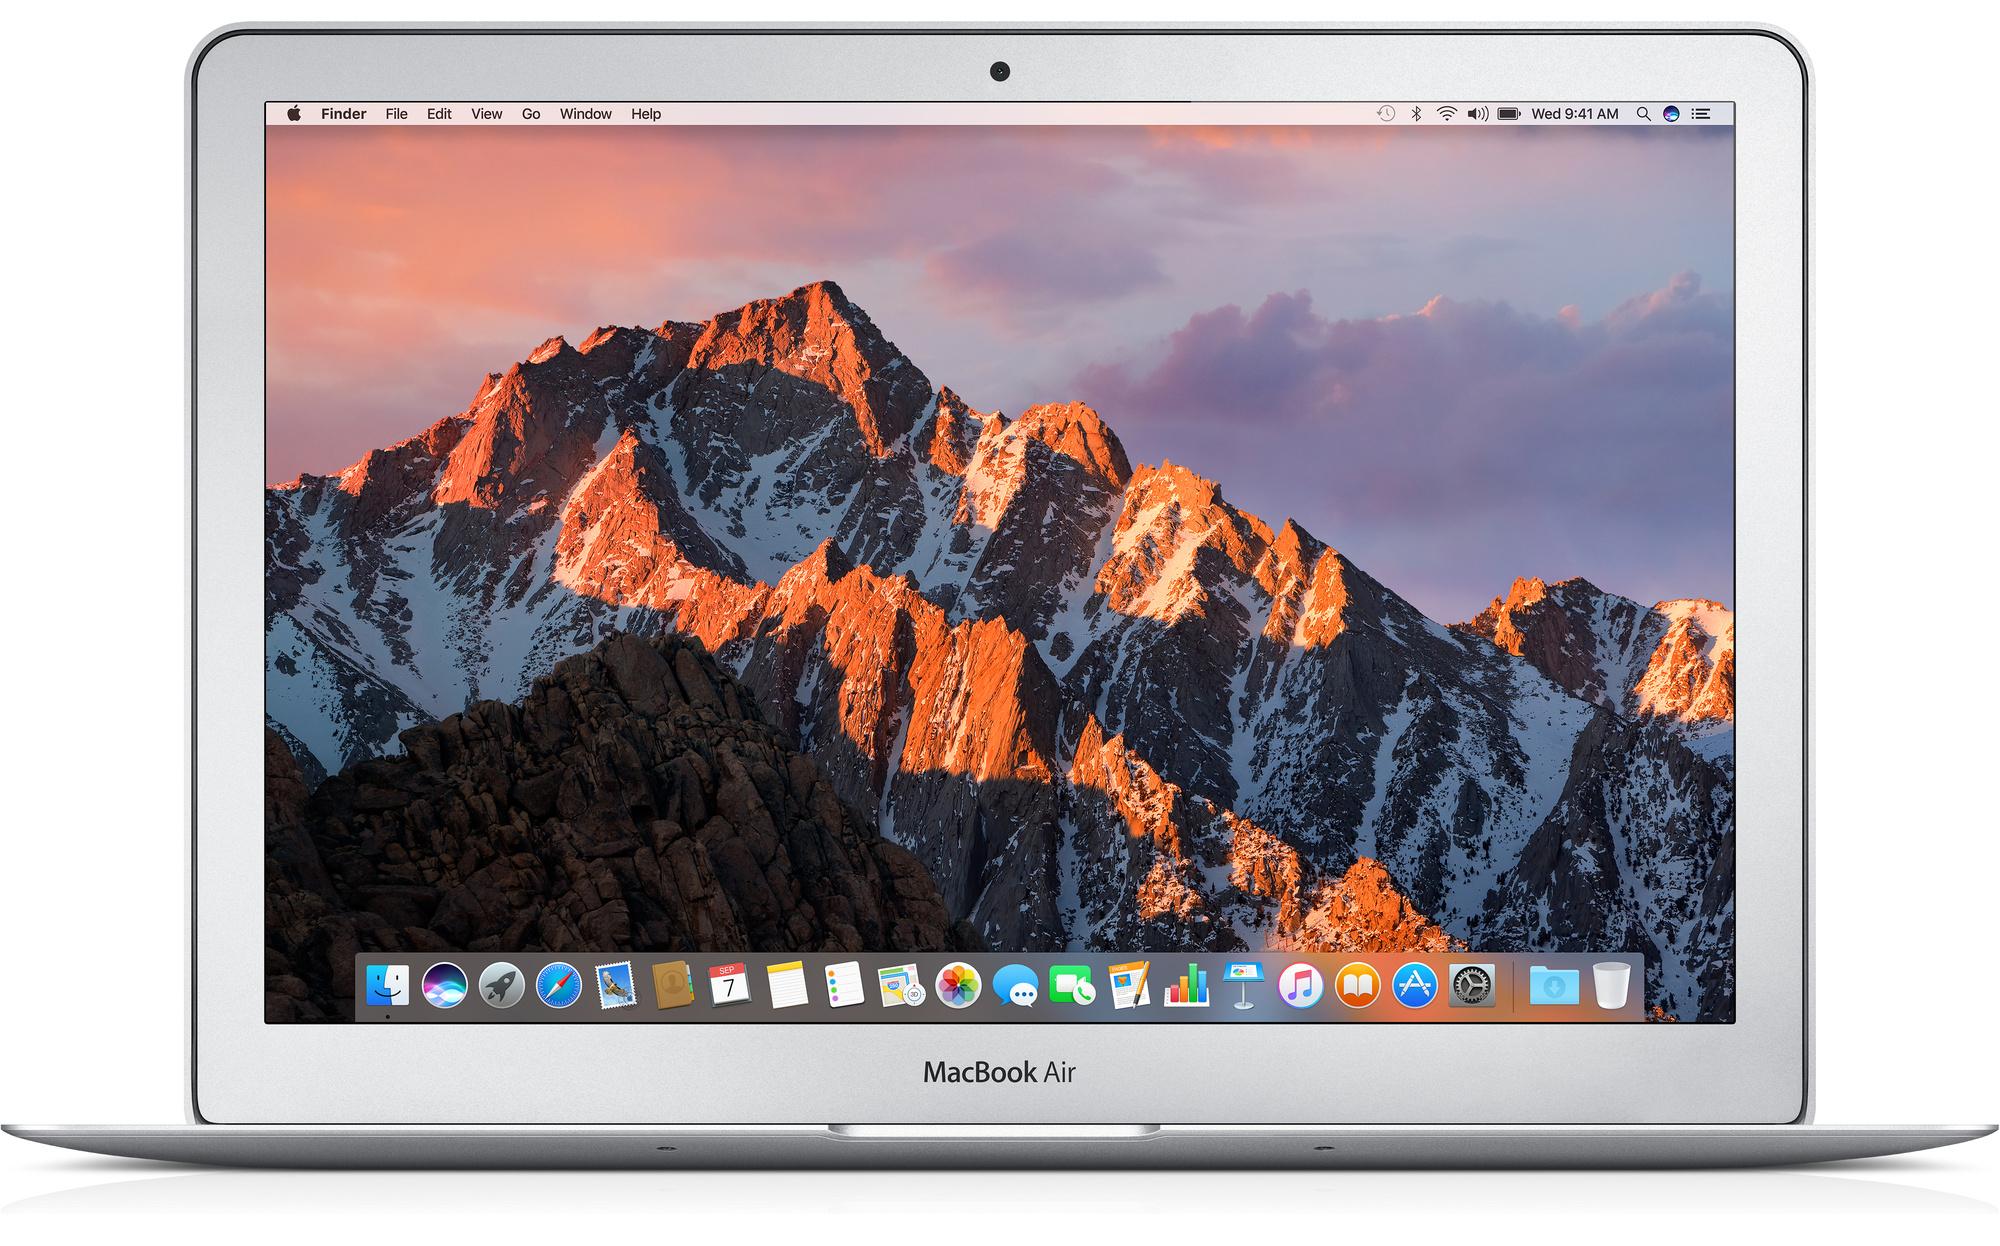 Refurbished 13.3-inch MacBook Air 1.8GHz dual-core Intel Core i5 - Apple  (UK)